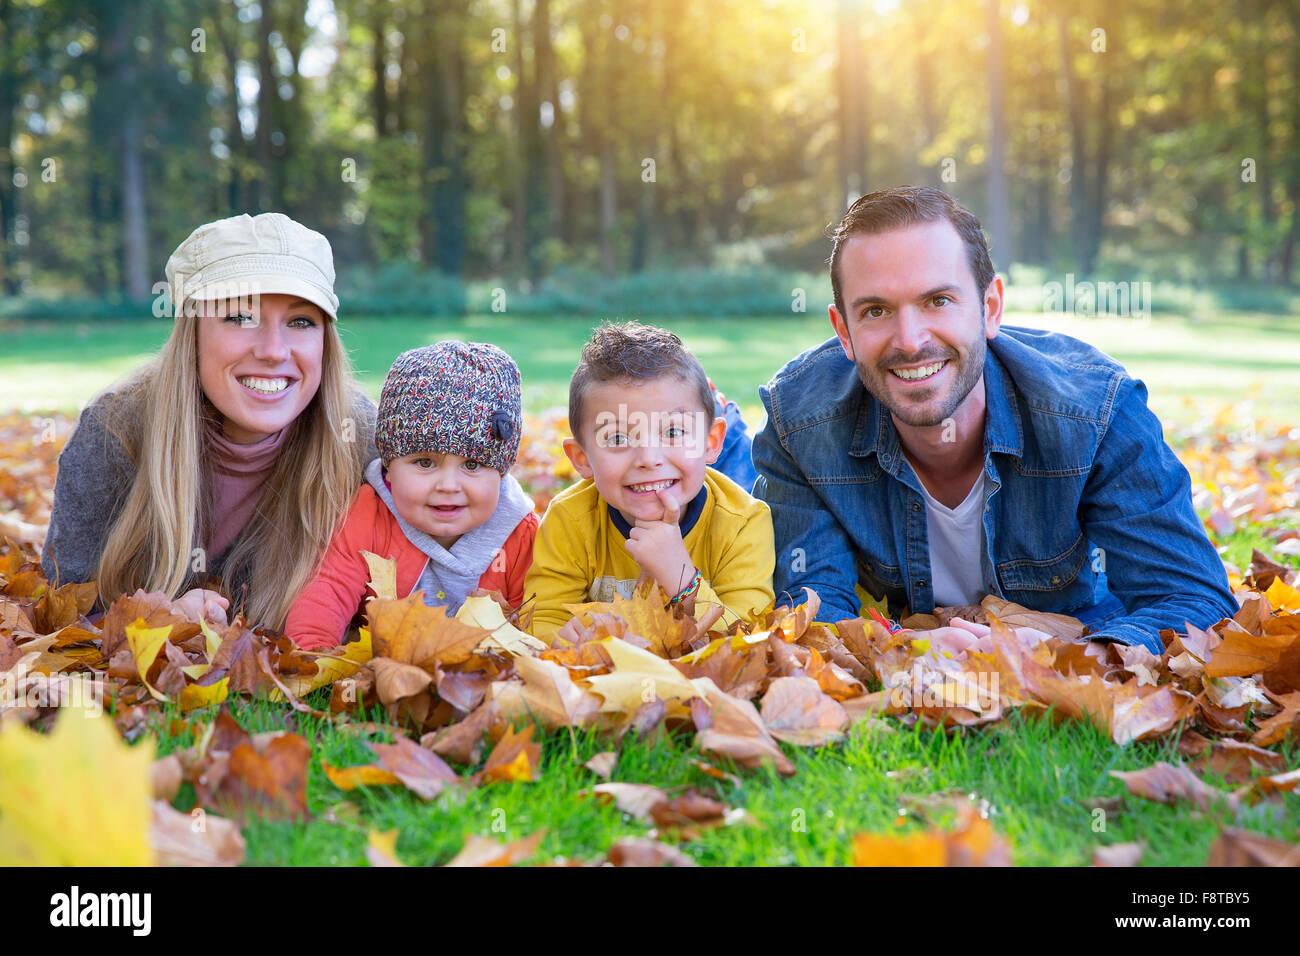 Retrato de una familia tumbado Imagen De Stock